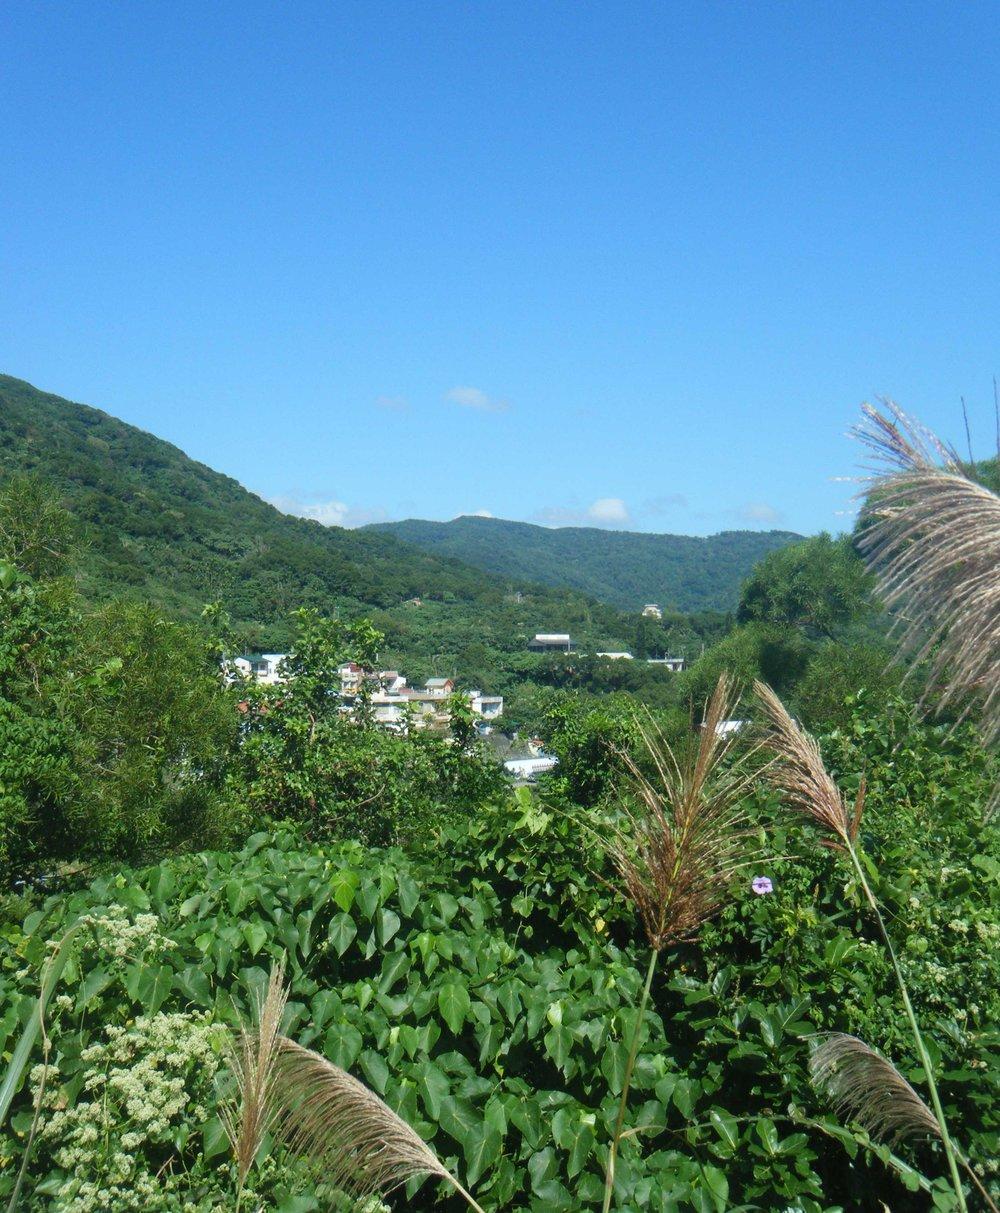 village nestled in montains.jpg